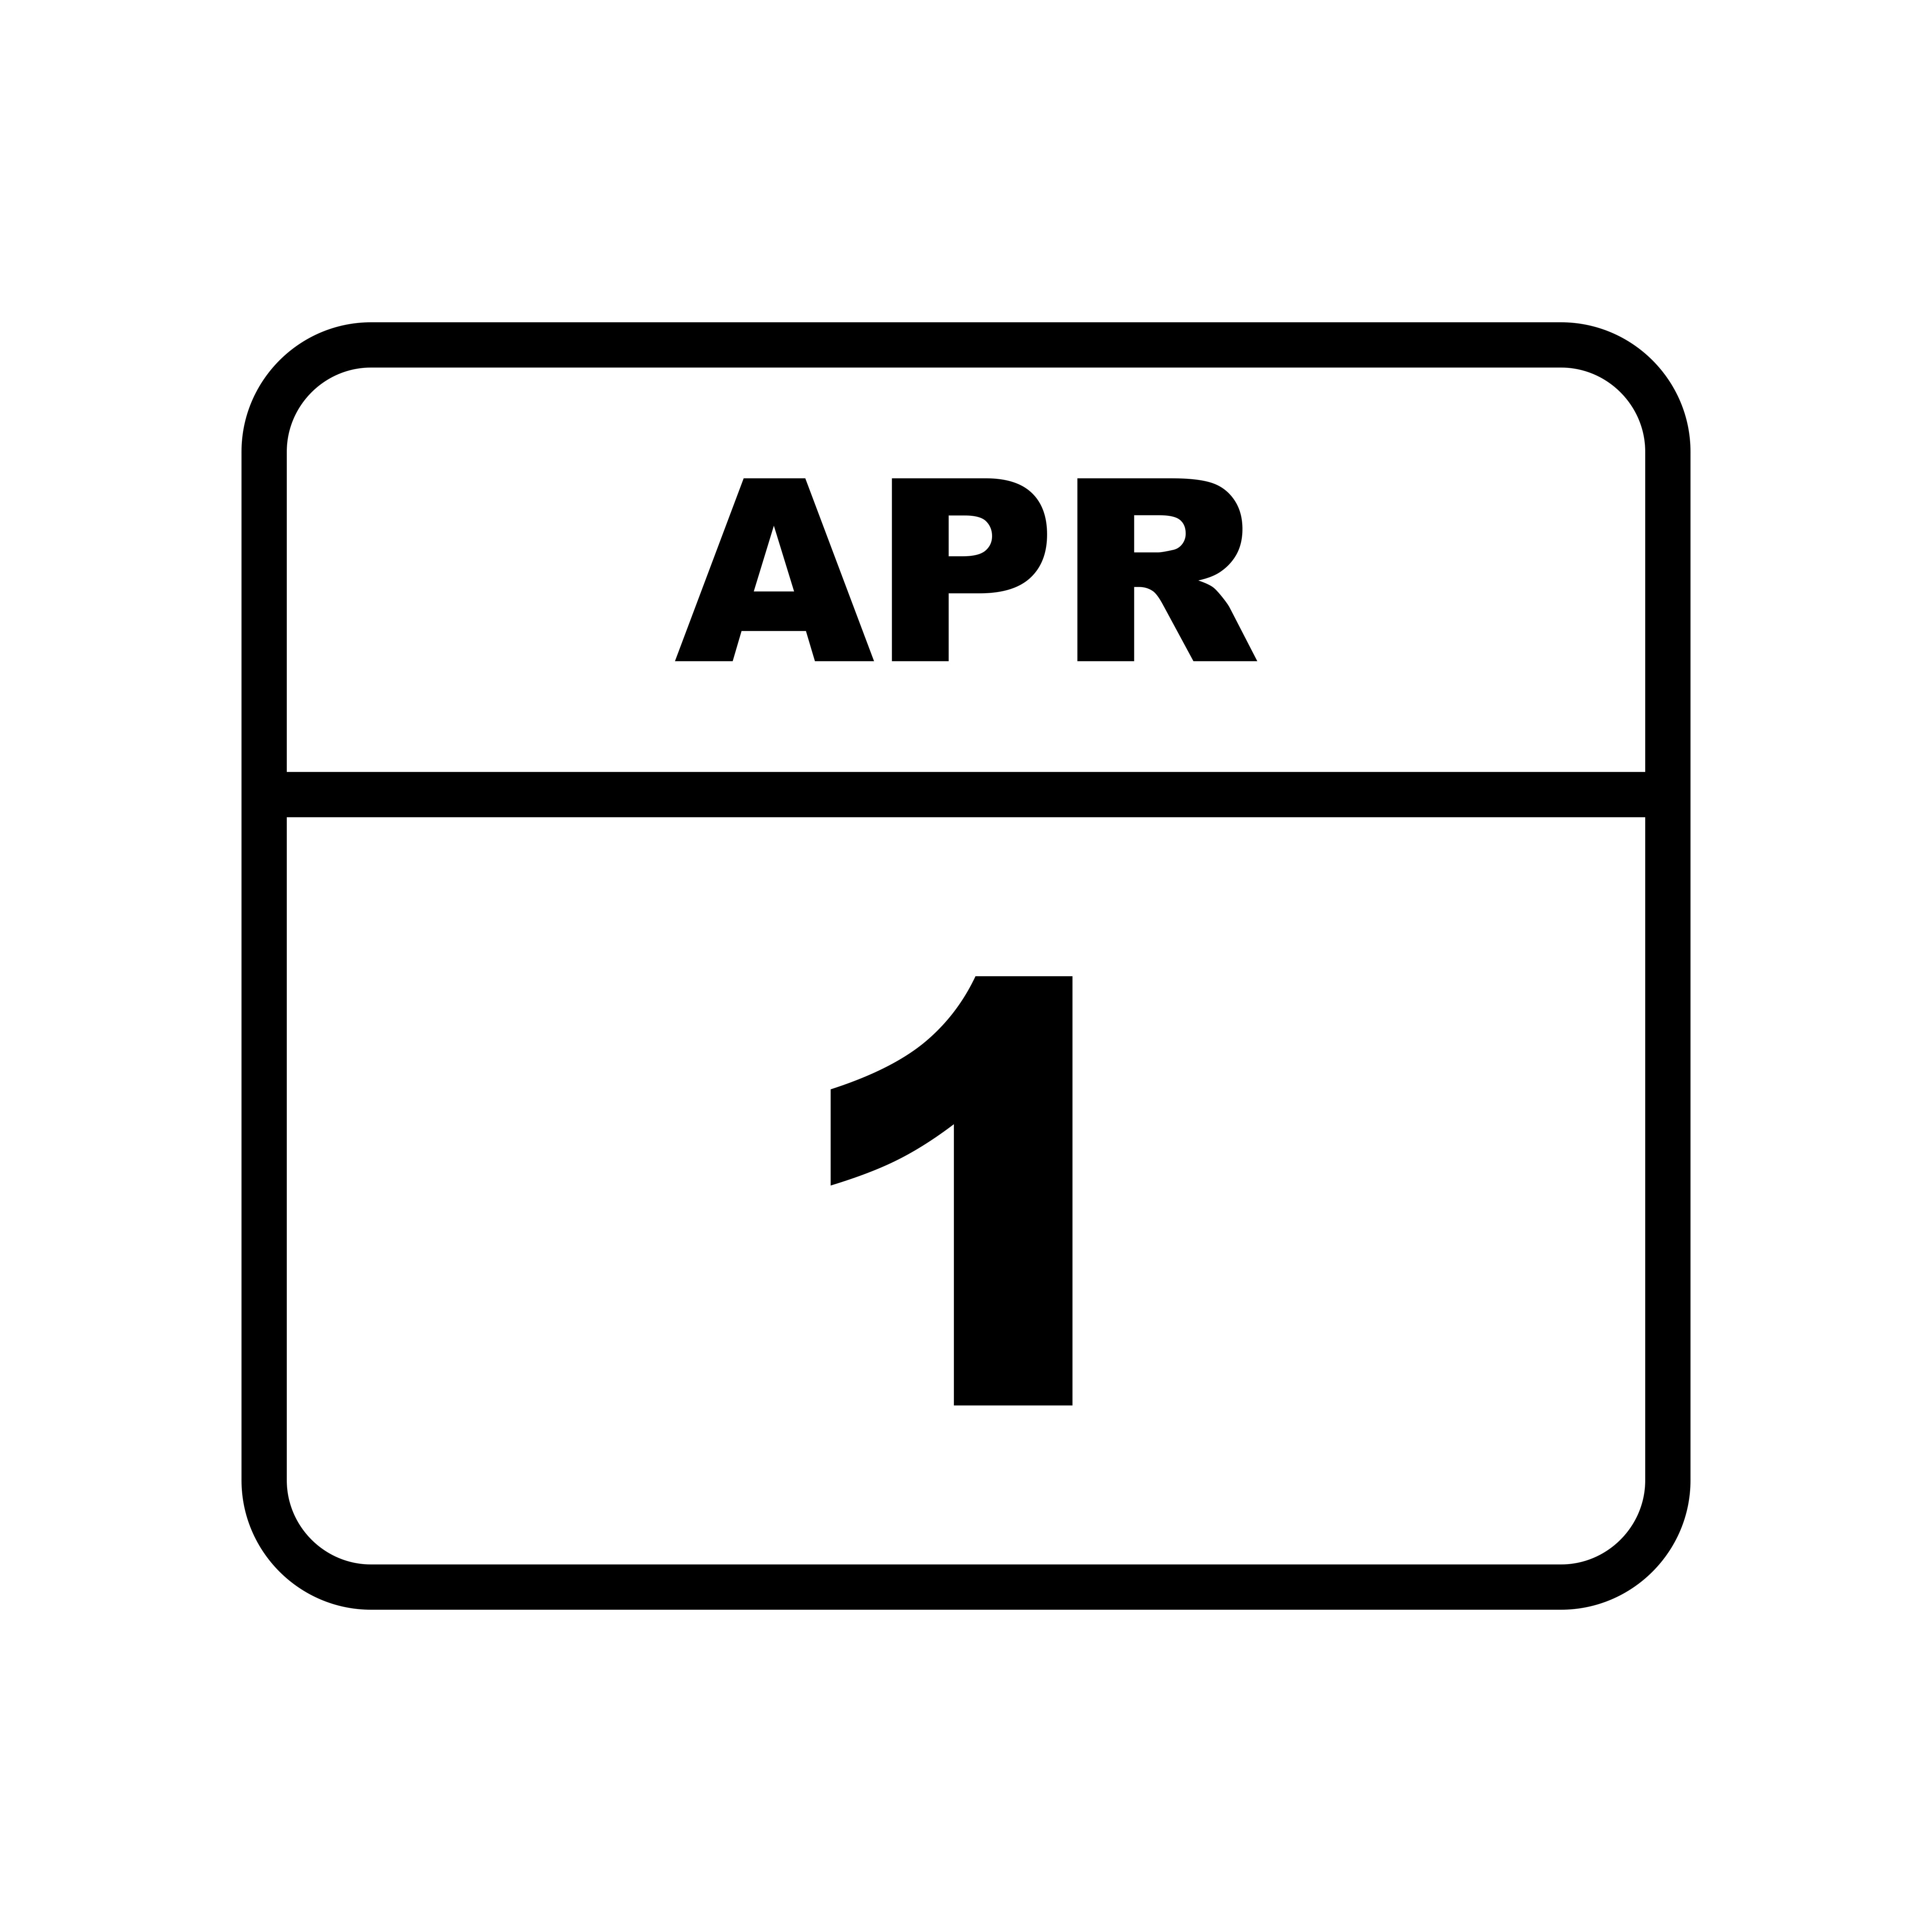 Datum Des 1 Aprils Fur Einen Tageskalender